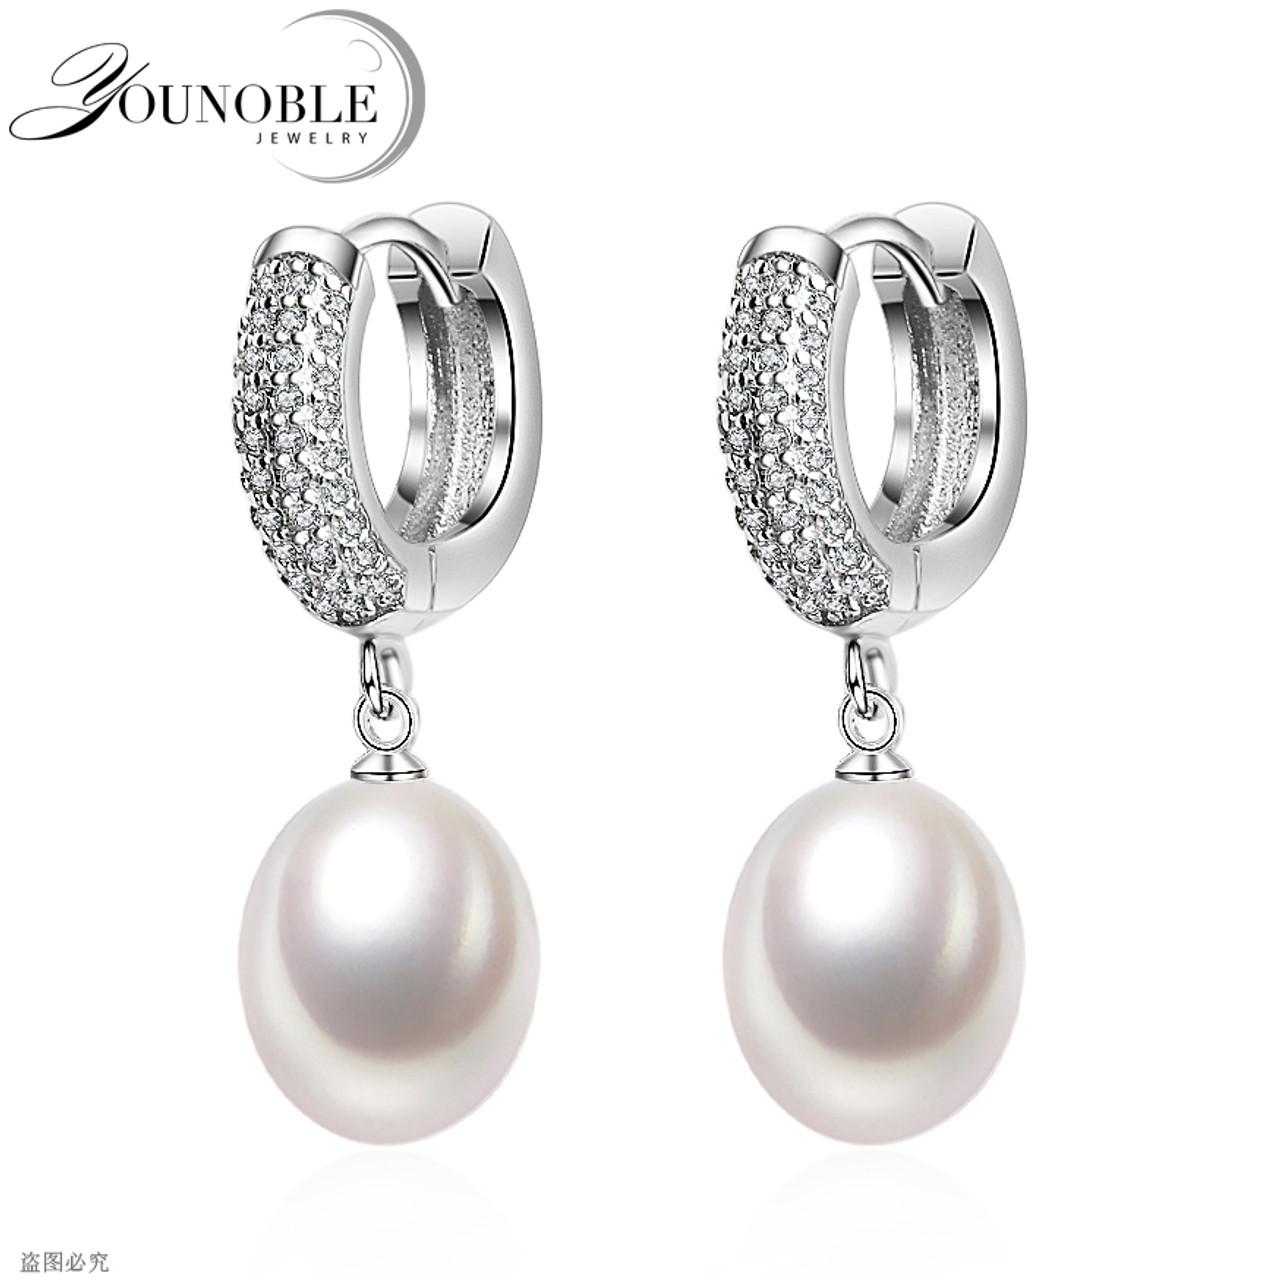 Real 925 Silver Natural Crystal Pearl Star Stud Earrings Women Wedding Jewelry